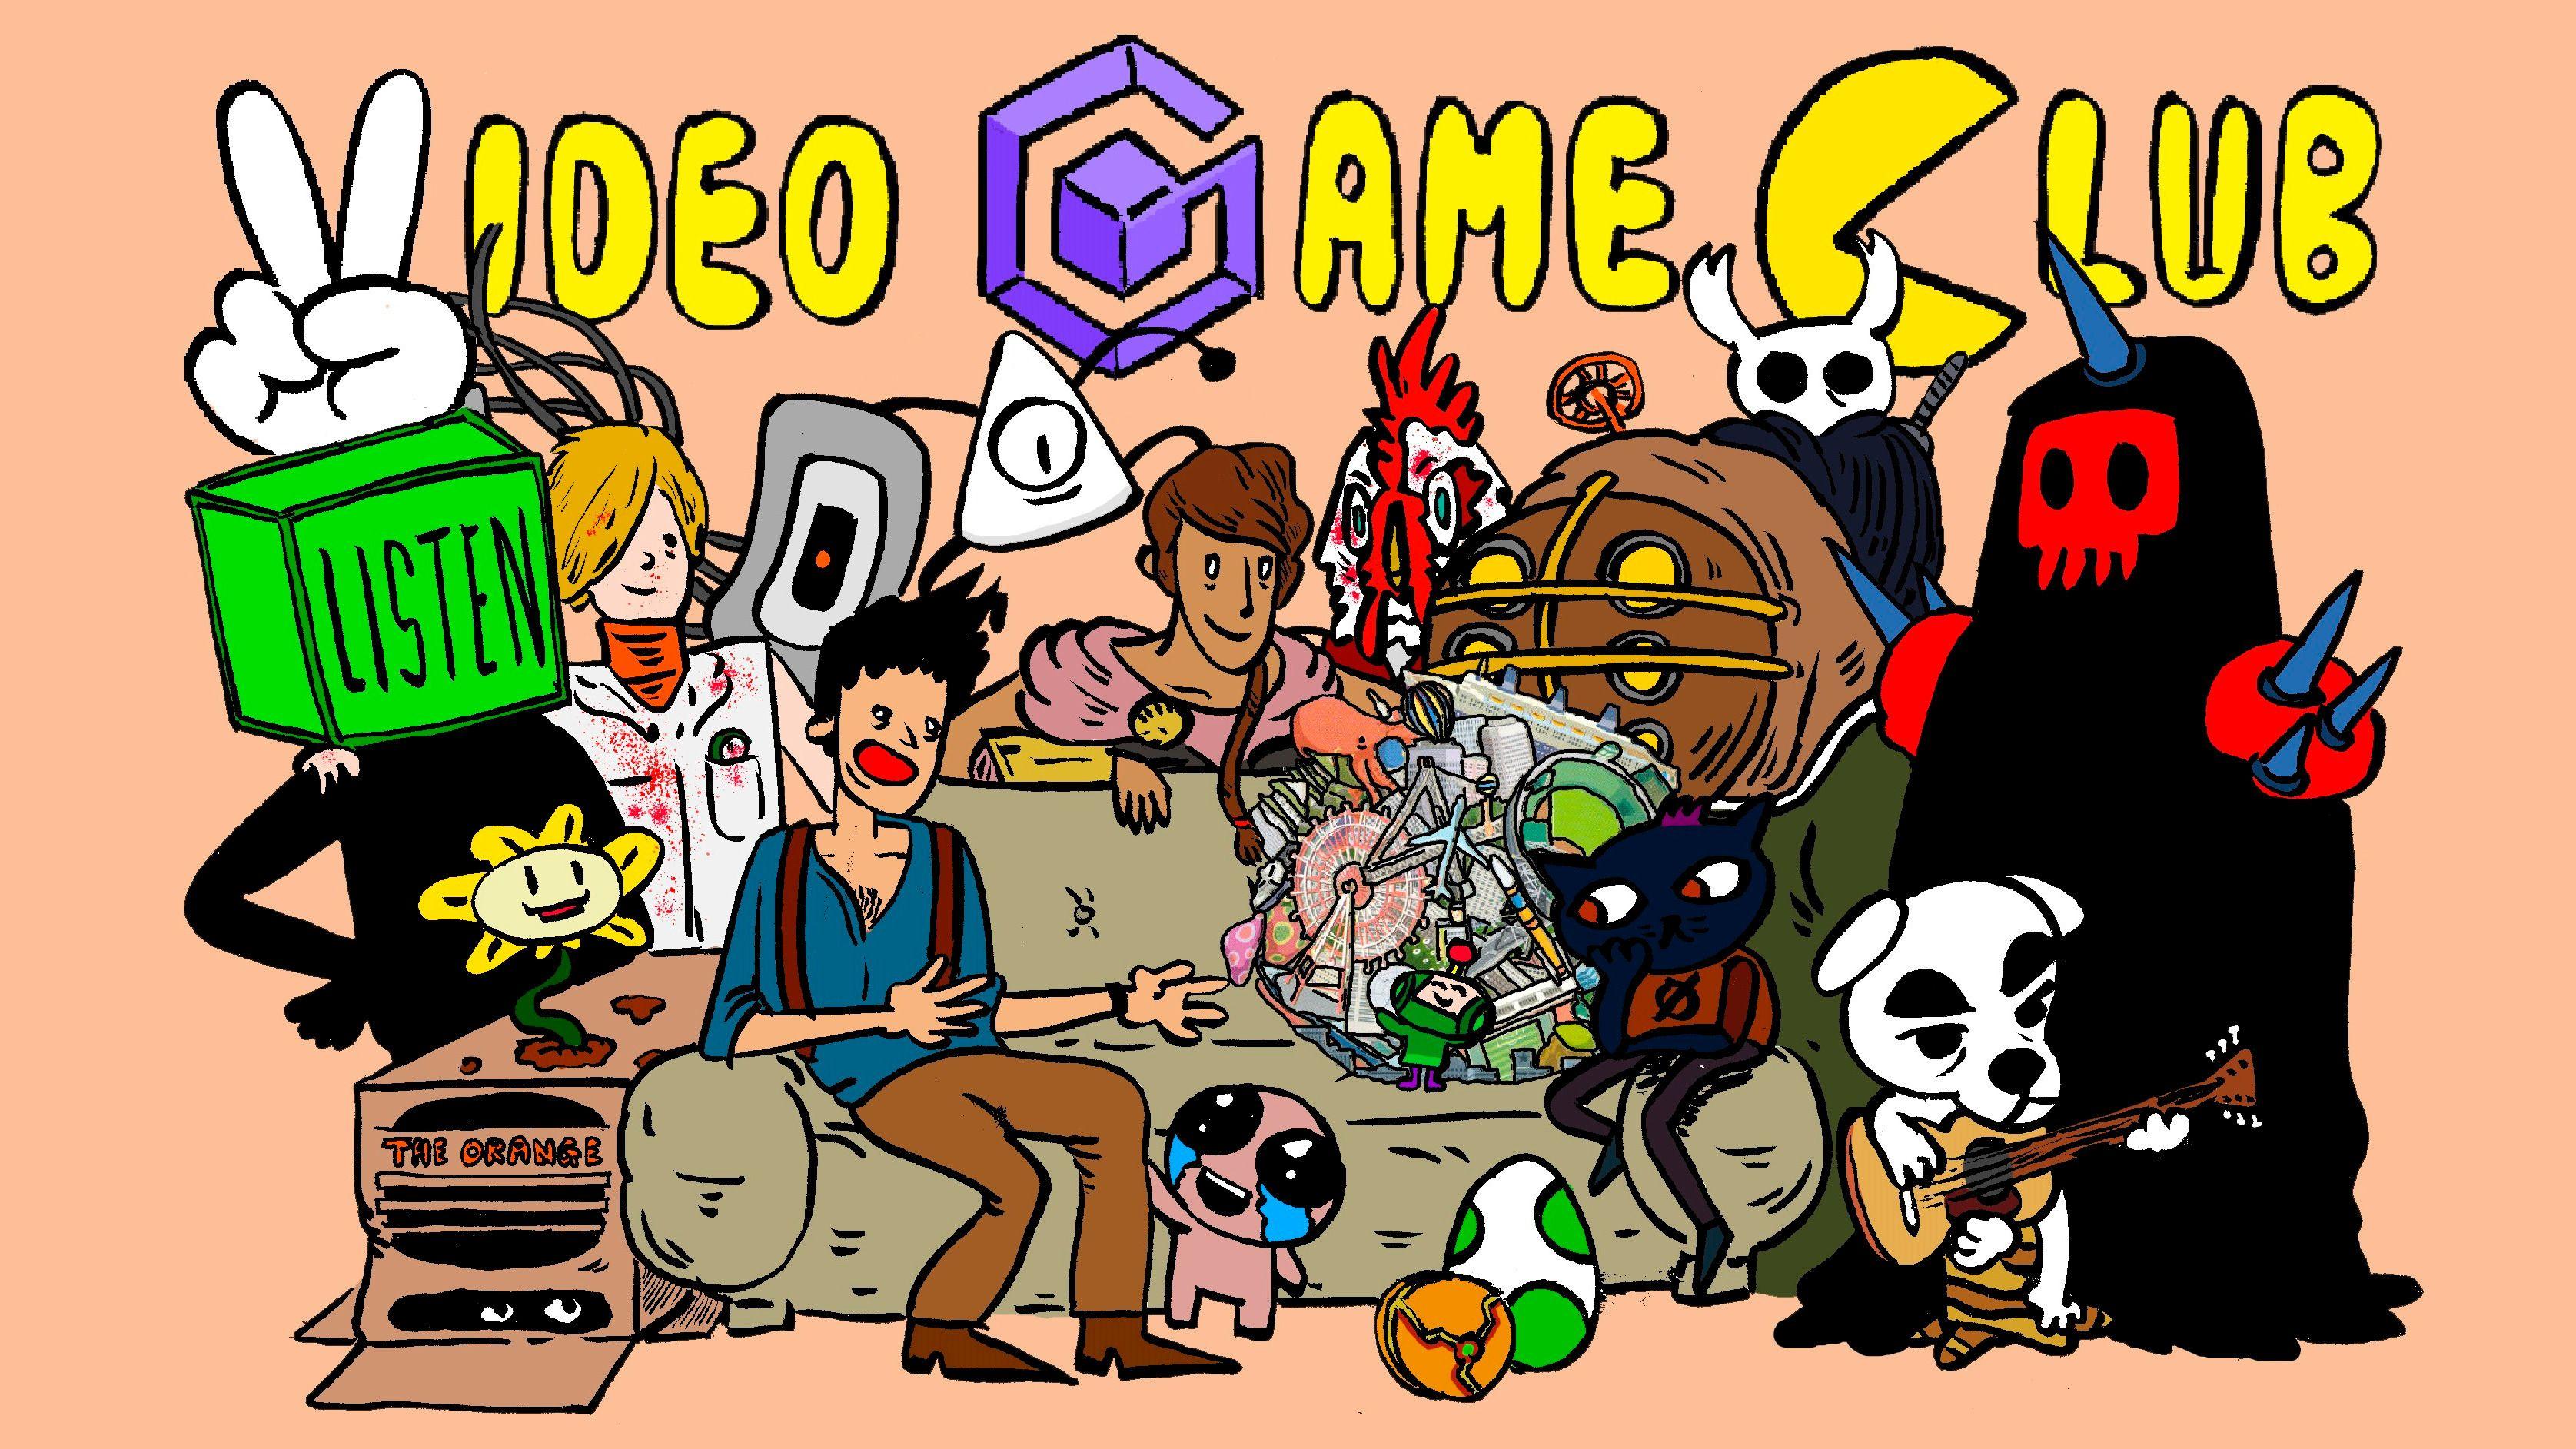 Video Game Club